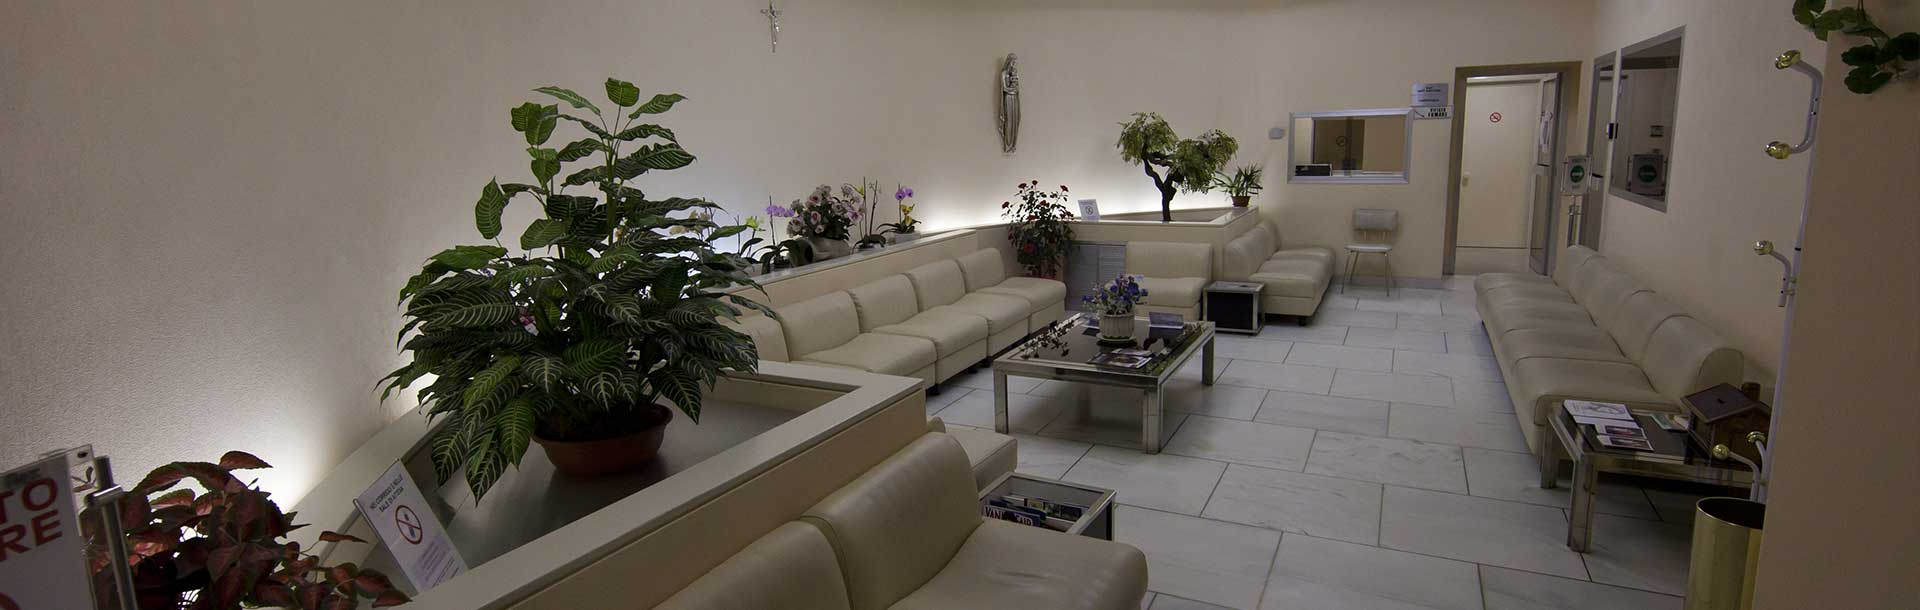 Casa Di Cura Villa Del Rosario Via Flaminia  Roma